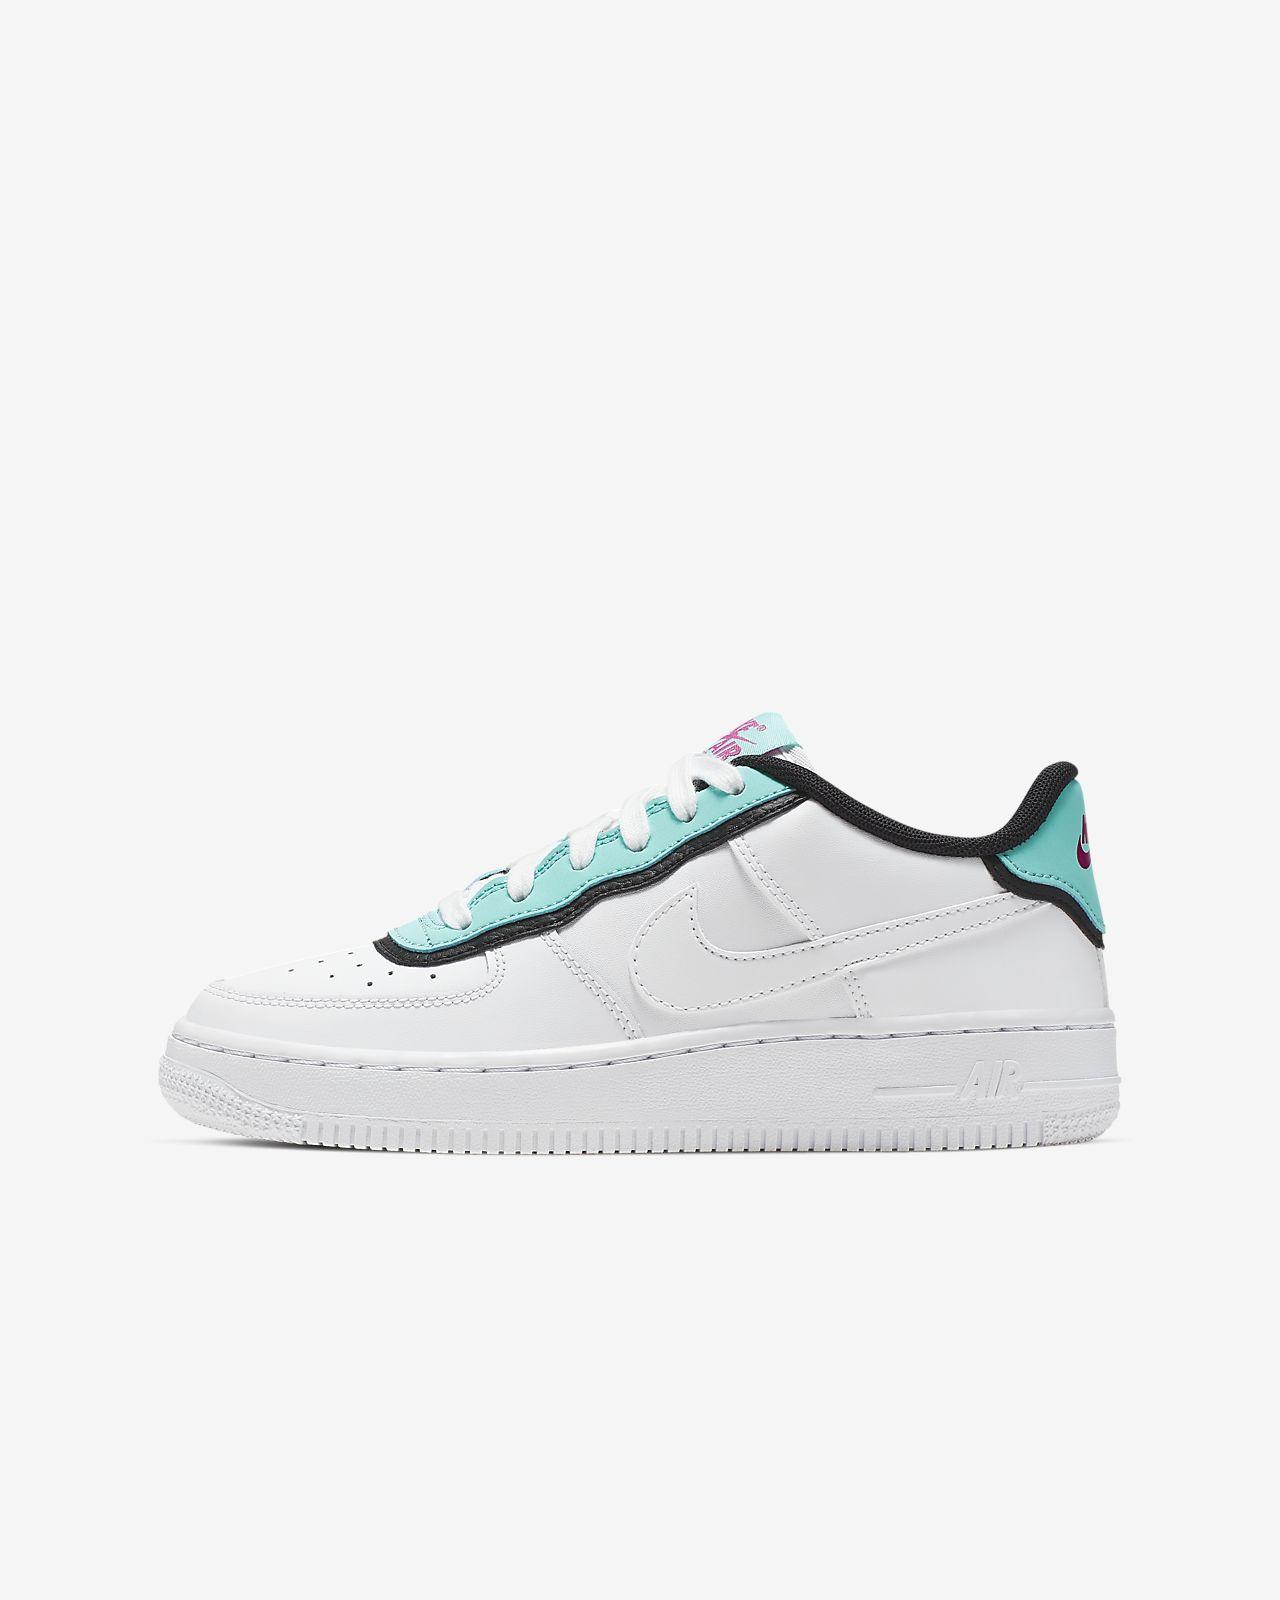 info for bdb2e b9fd6 ... Nike Air Force 1 LV8 1 DBL Schuh für ältere Kinder